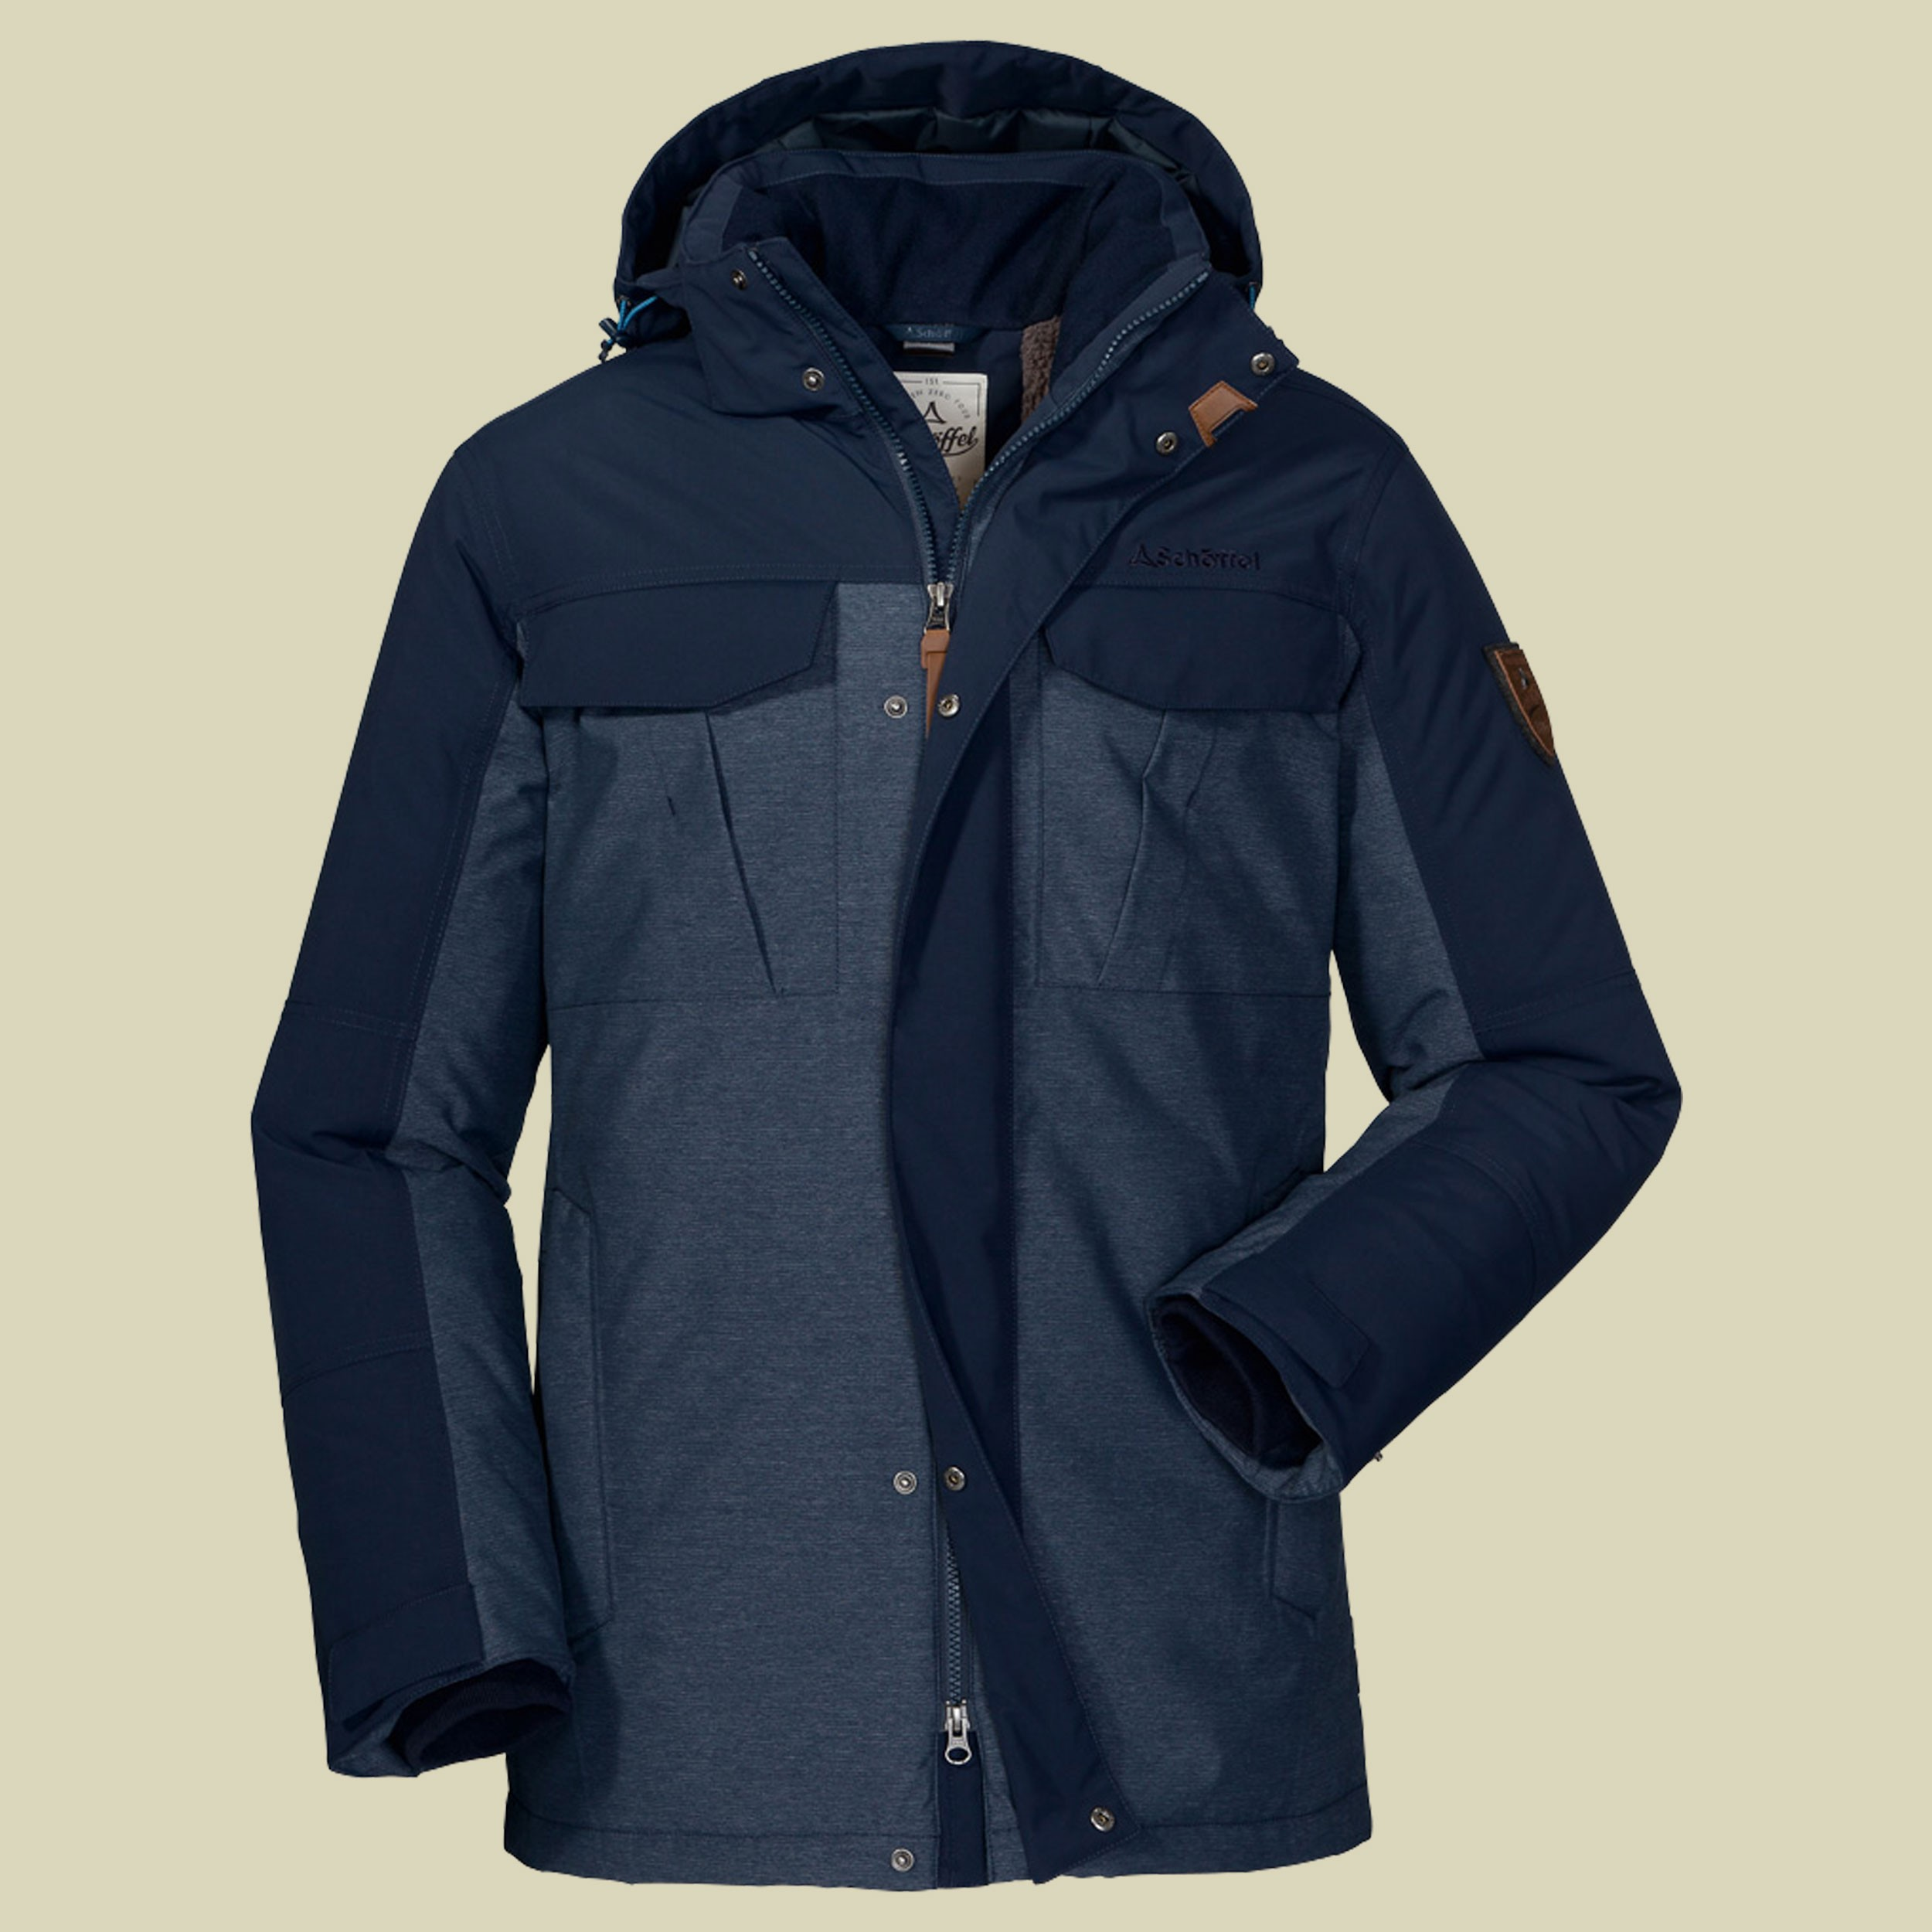 Insulated Jacket Lipezk1 Men